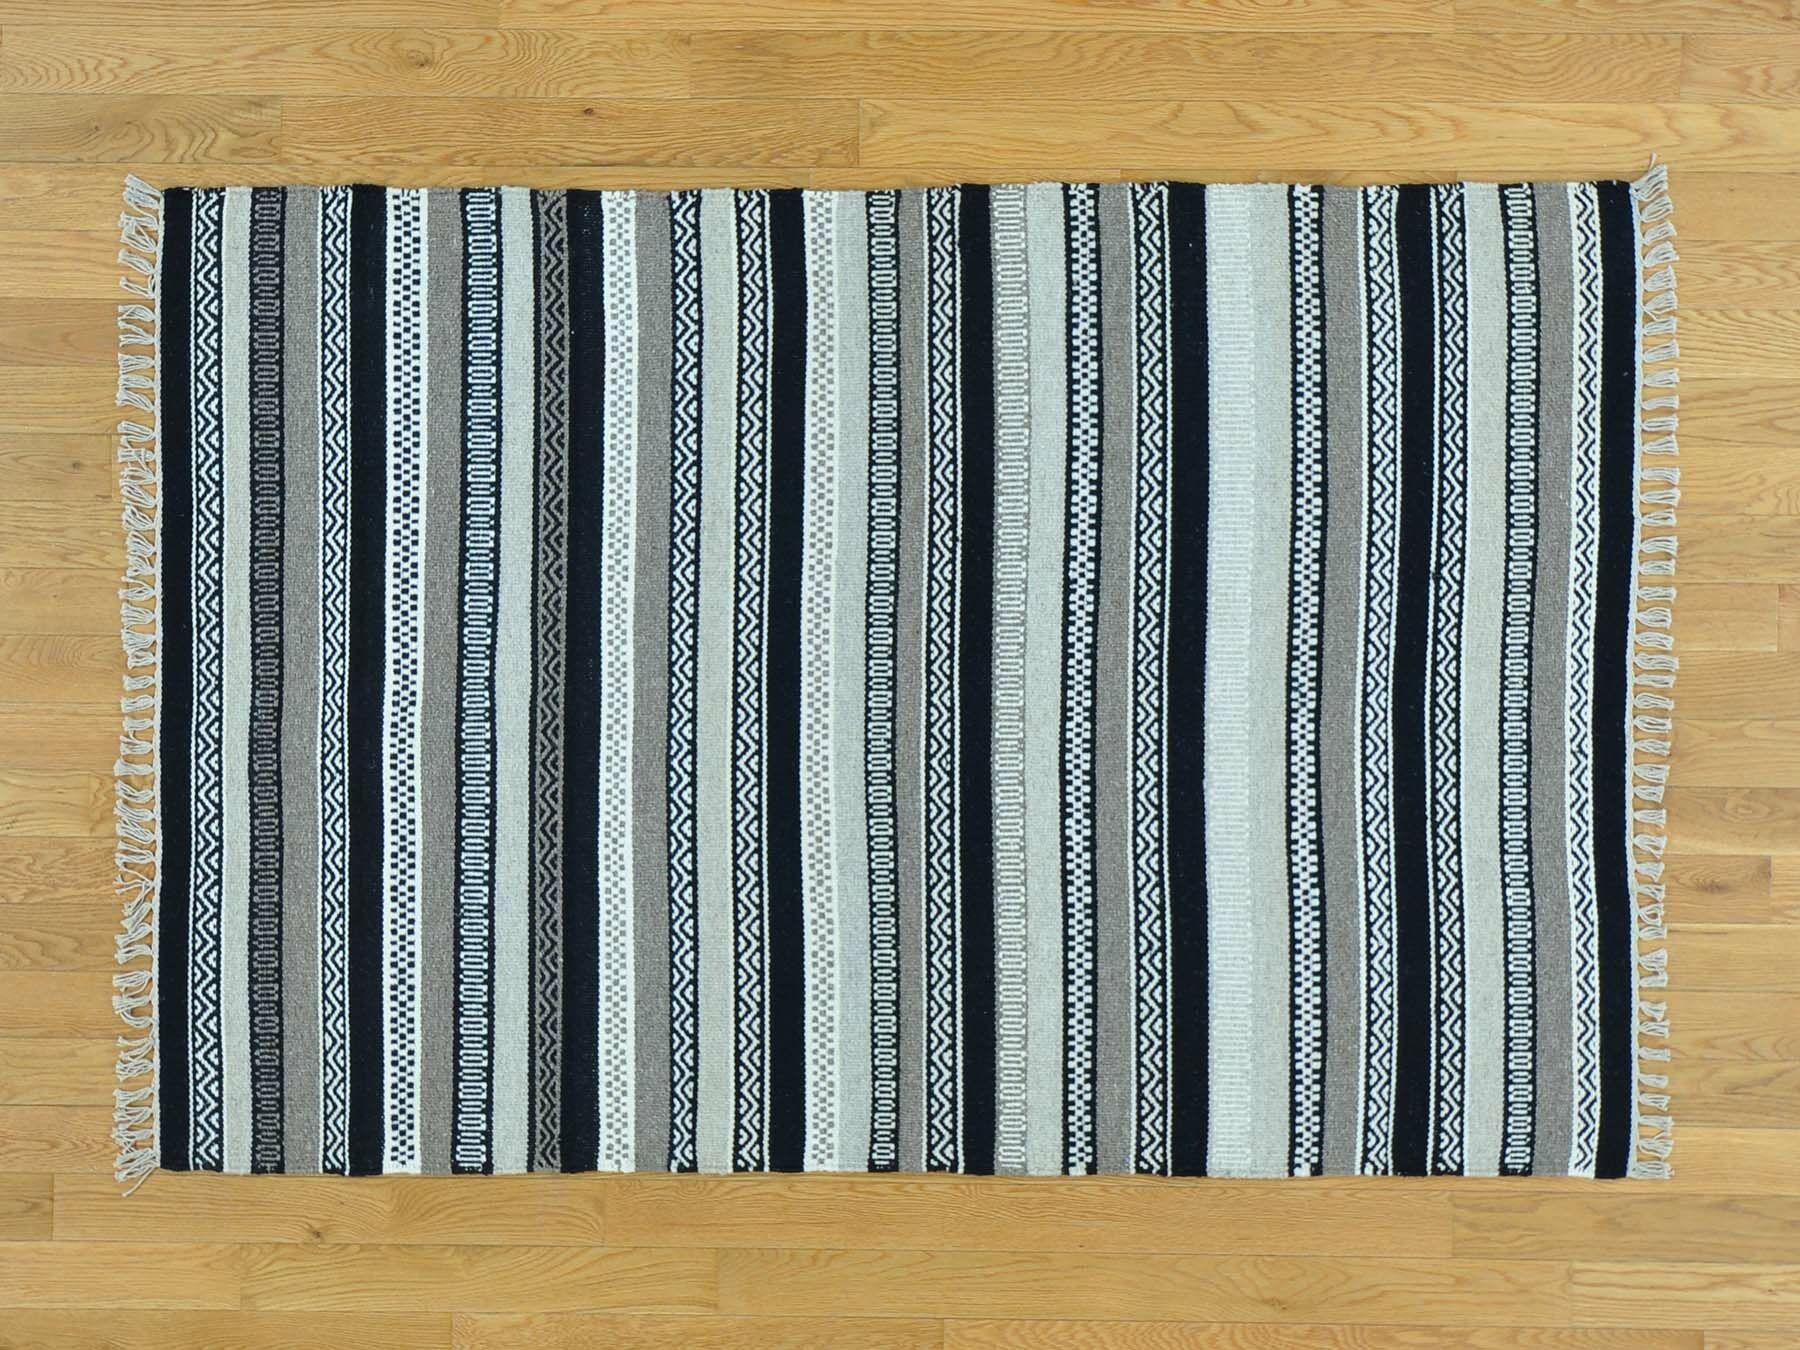 One-of-a-Kind Bessey Striped Handmade Kilim Wool Area Rug